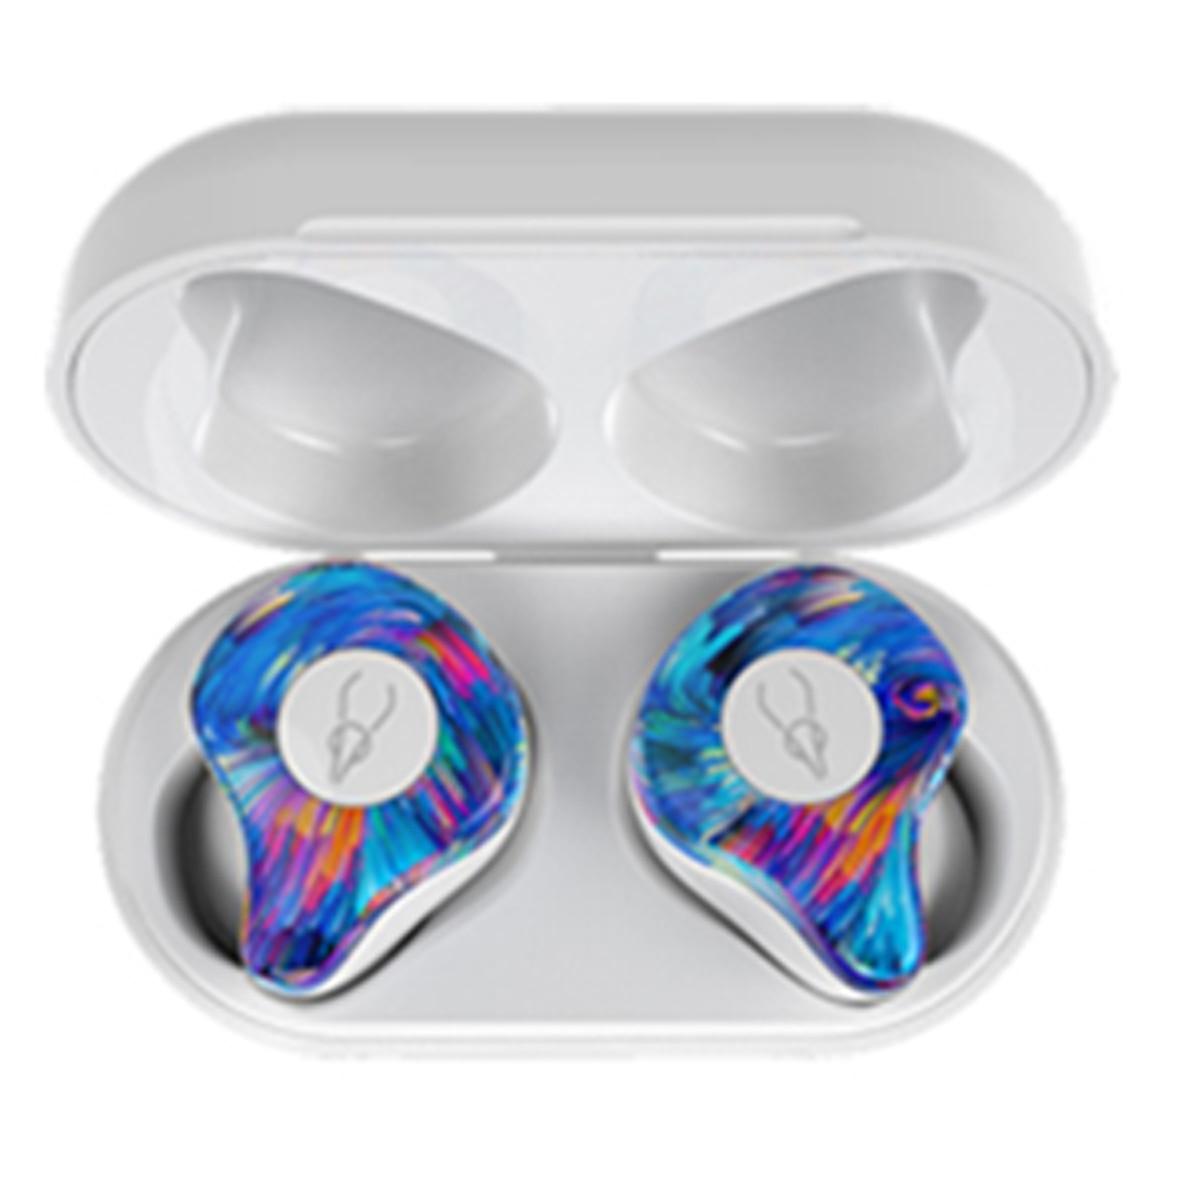 Porta do Fone de Ouvido sem Fio Fones de Ouvido sem Fio Fone de Ouvido Fones de Ouvido Fones de Ouvido sem Fio à Prova Sabbat Mini Bluetooth Estéreo 5.0 à Prova d' Água X12 Pro Mod. 1458290